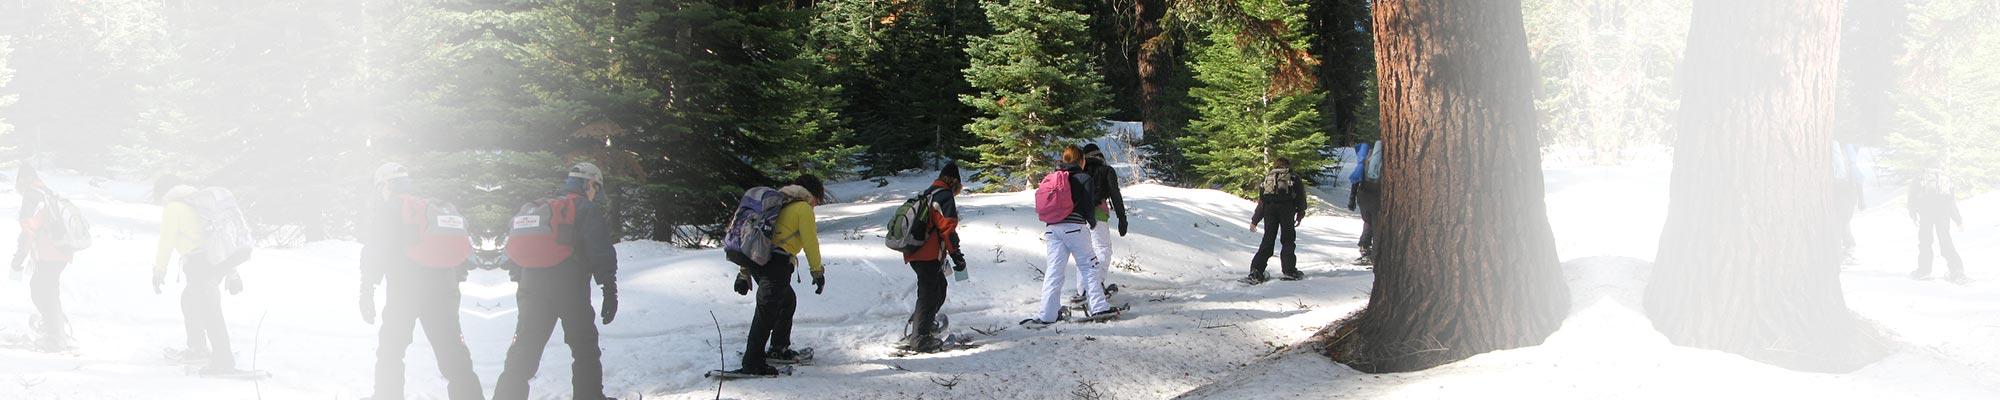 Montecito Sequoia Lodge, Snow